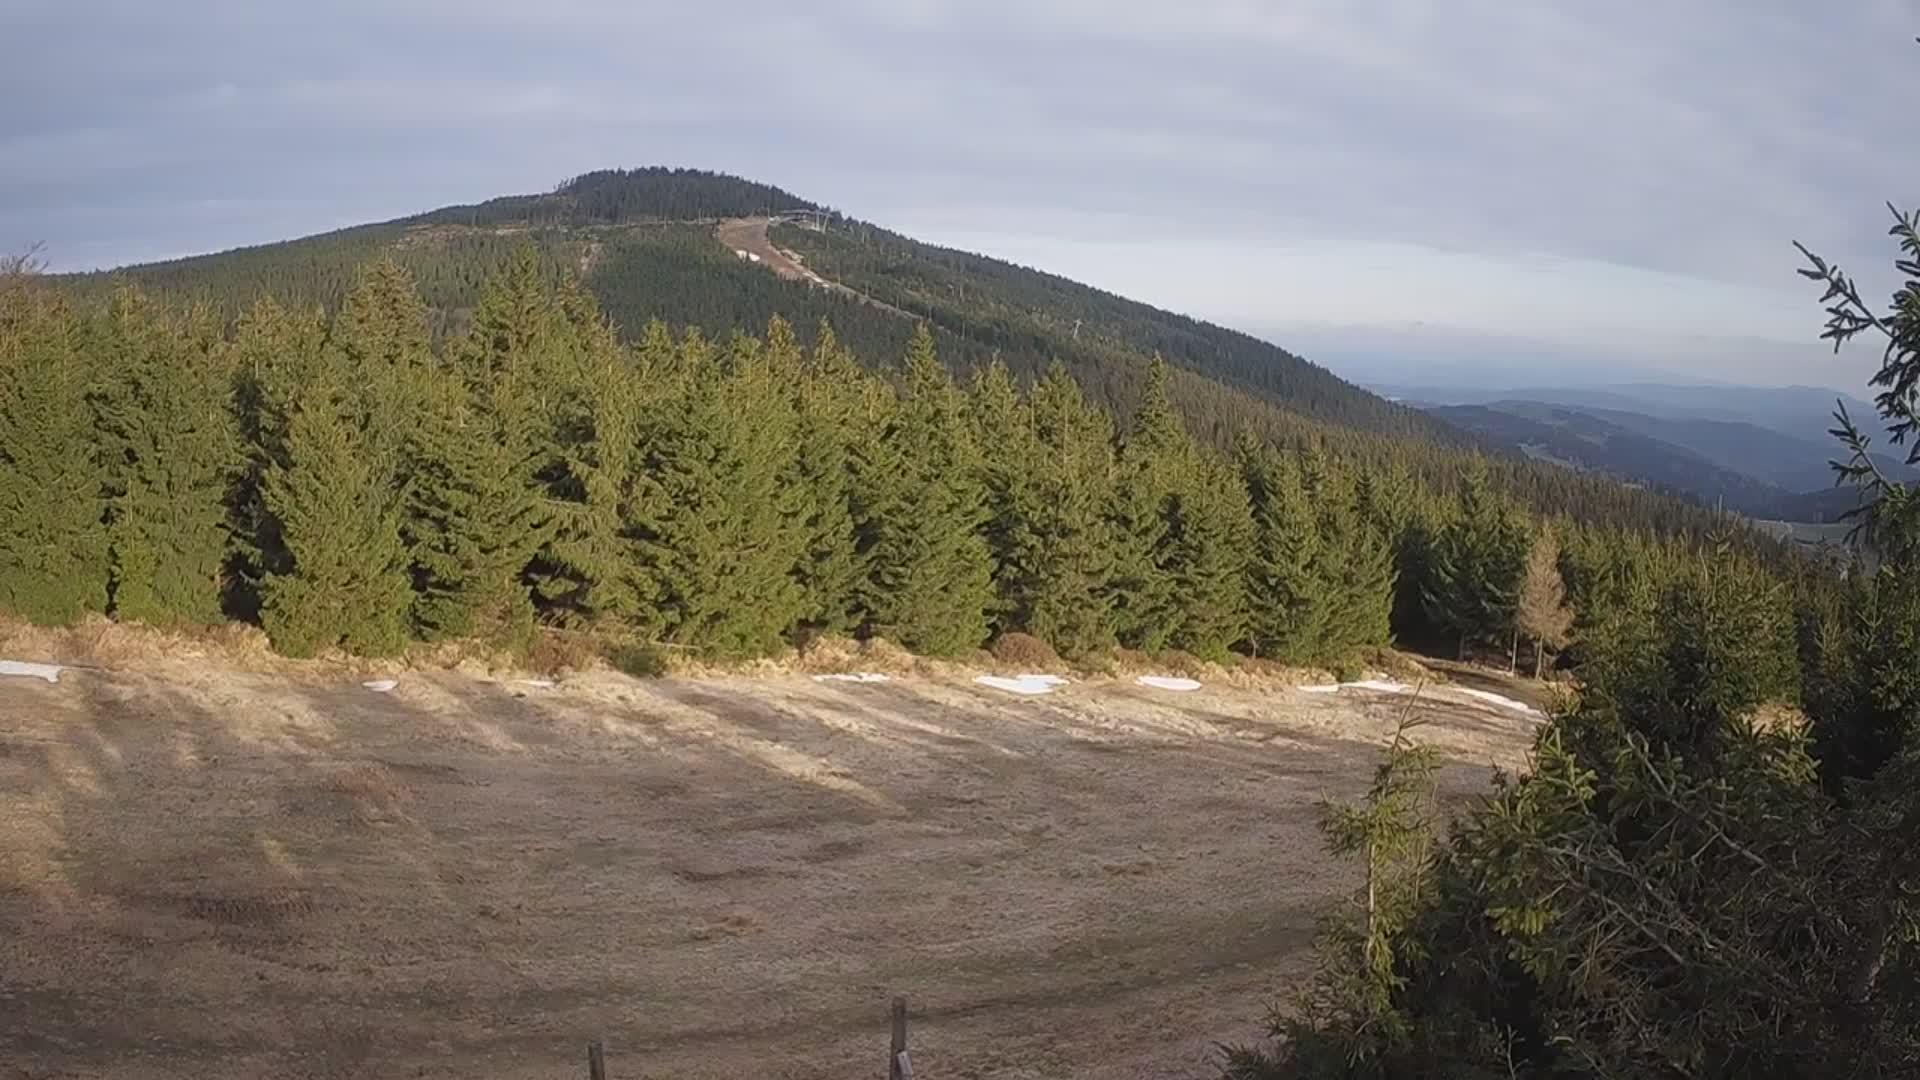 Webcam Skigebiet Czarna Gora cam 7 - Glatzer Schneegebirge